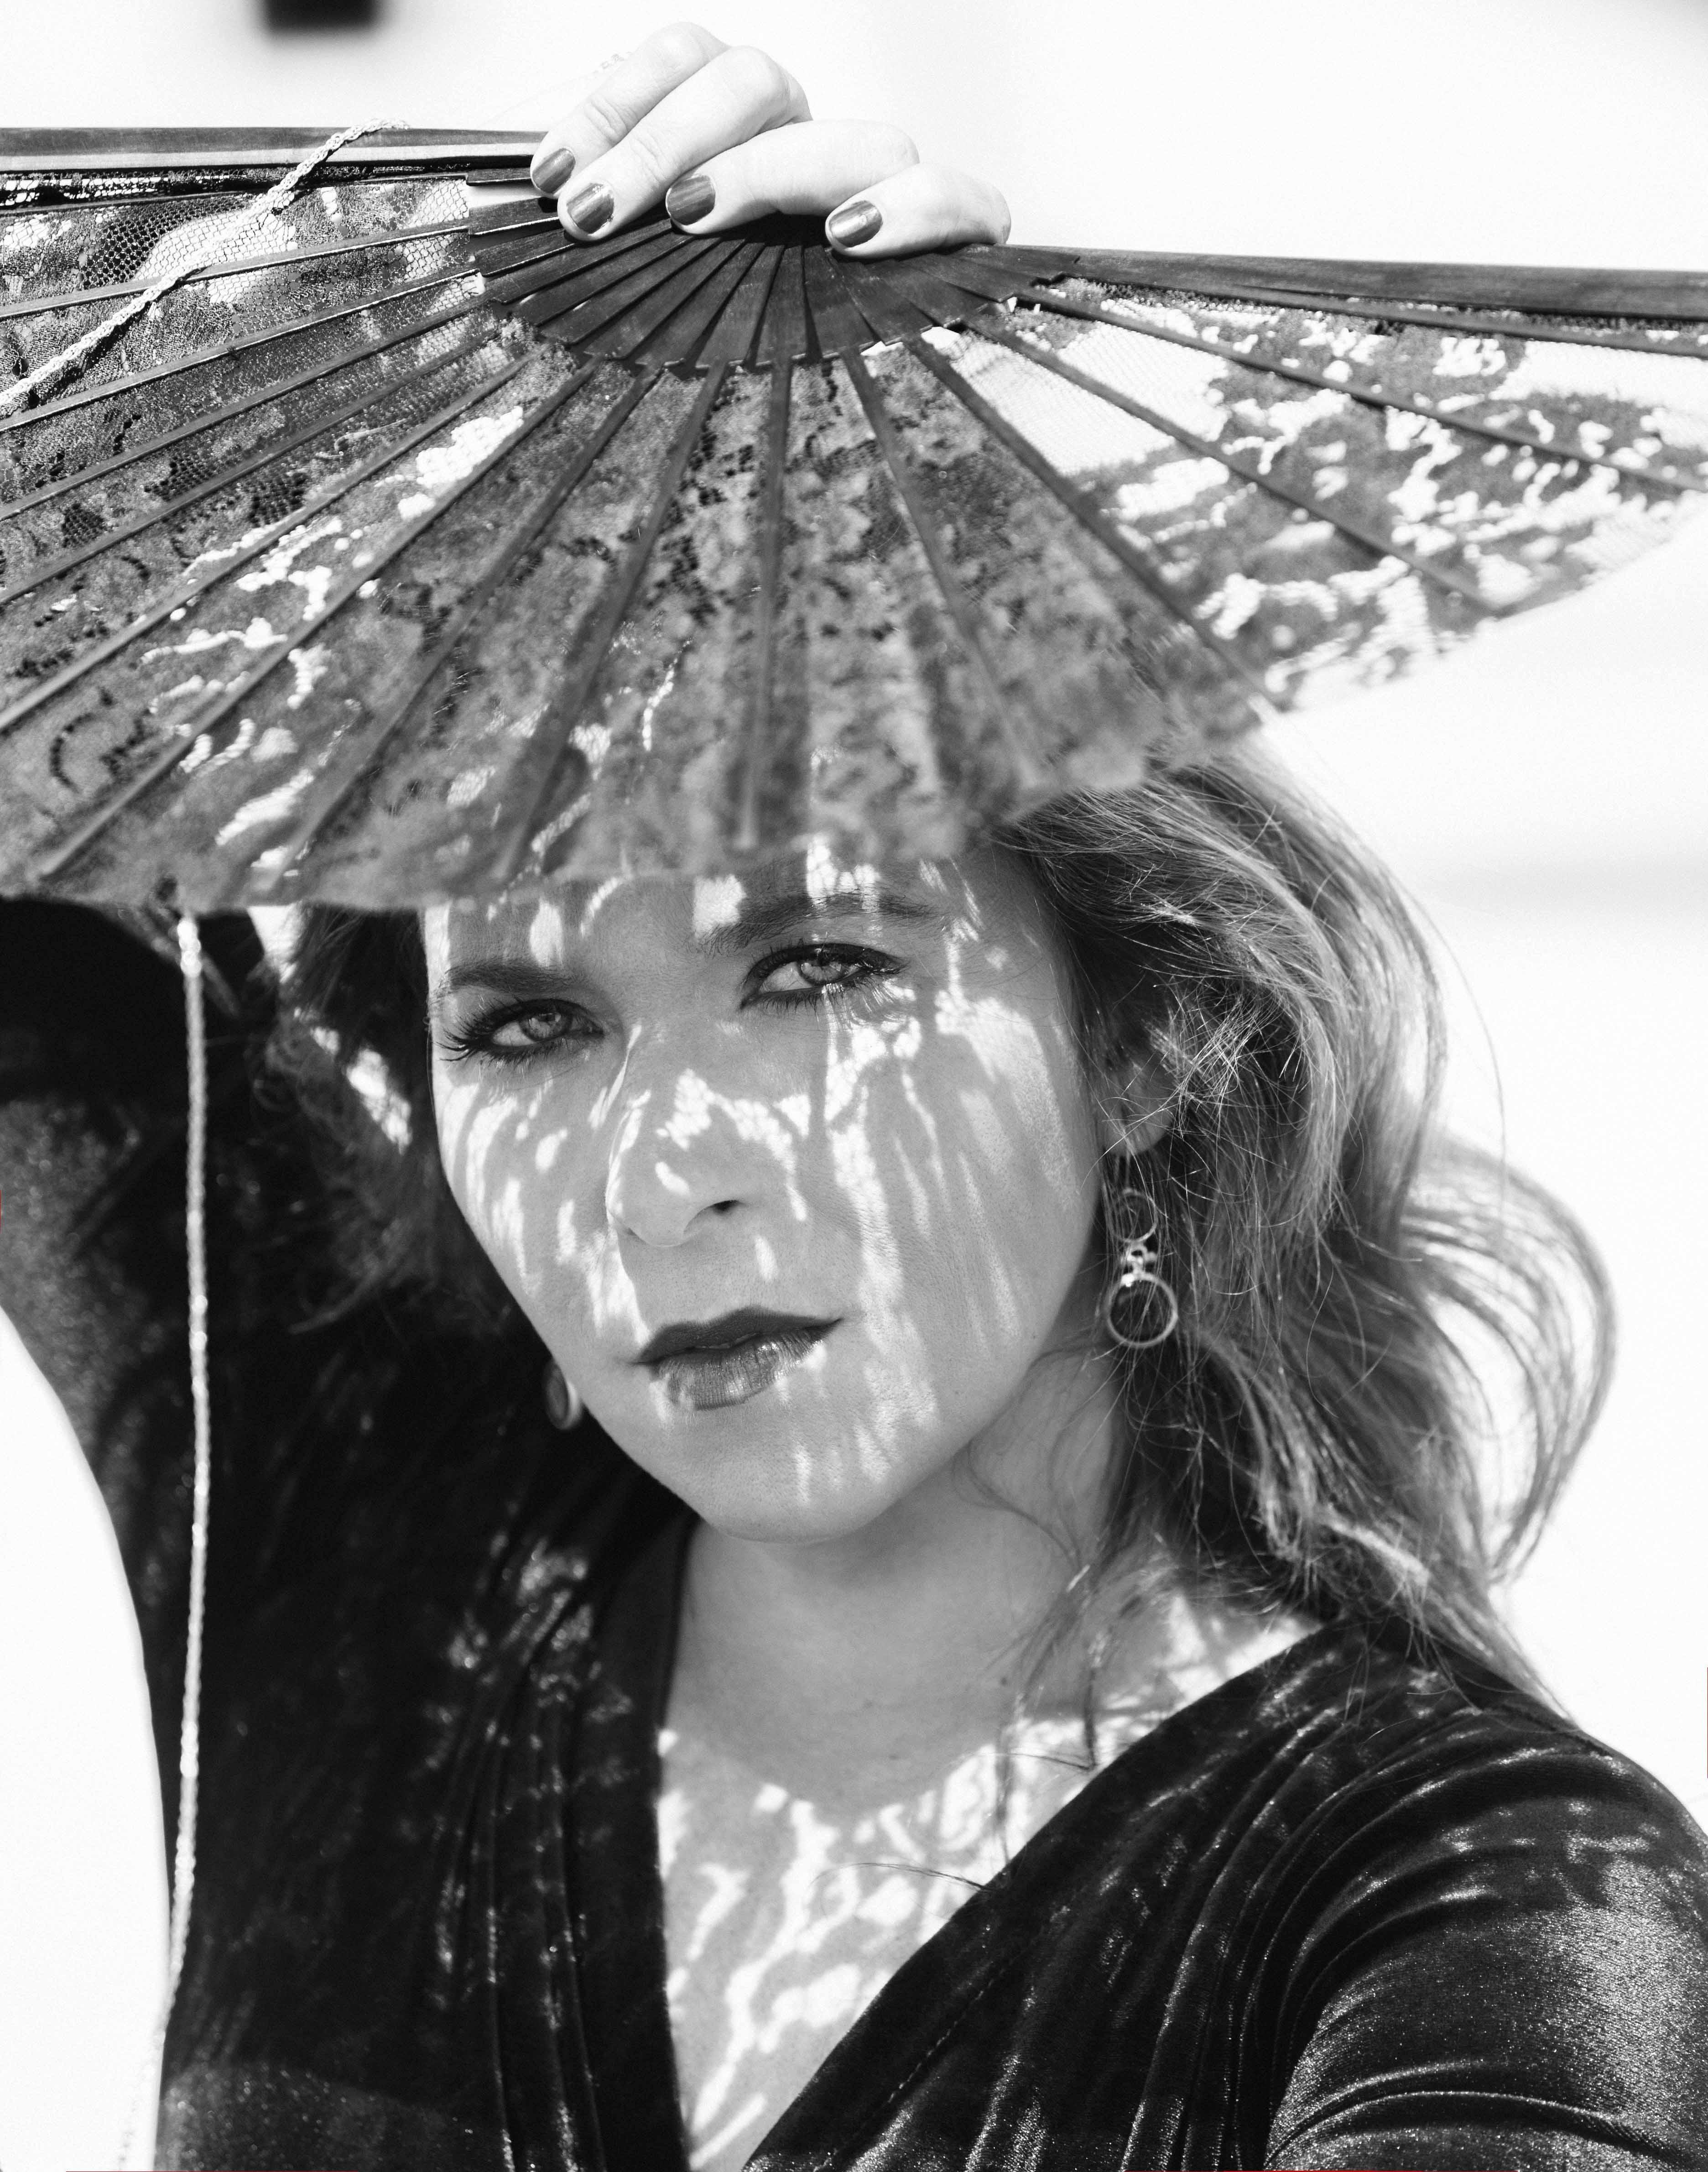 Rocio Marquez - FESTIVAL ACCENTS - CANVI DIA I HORA